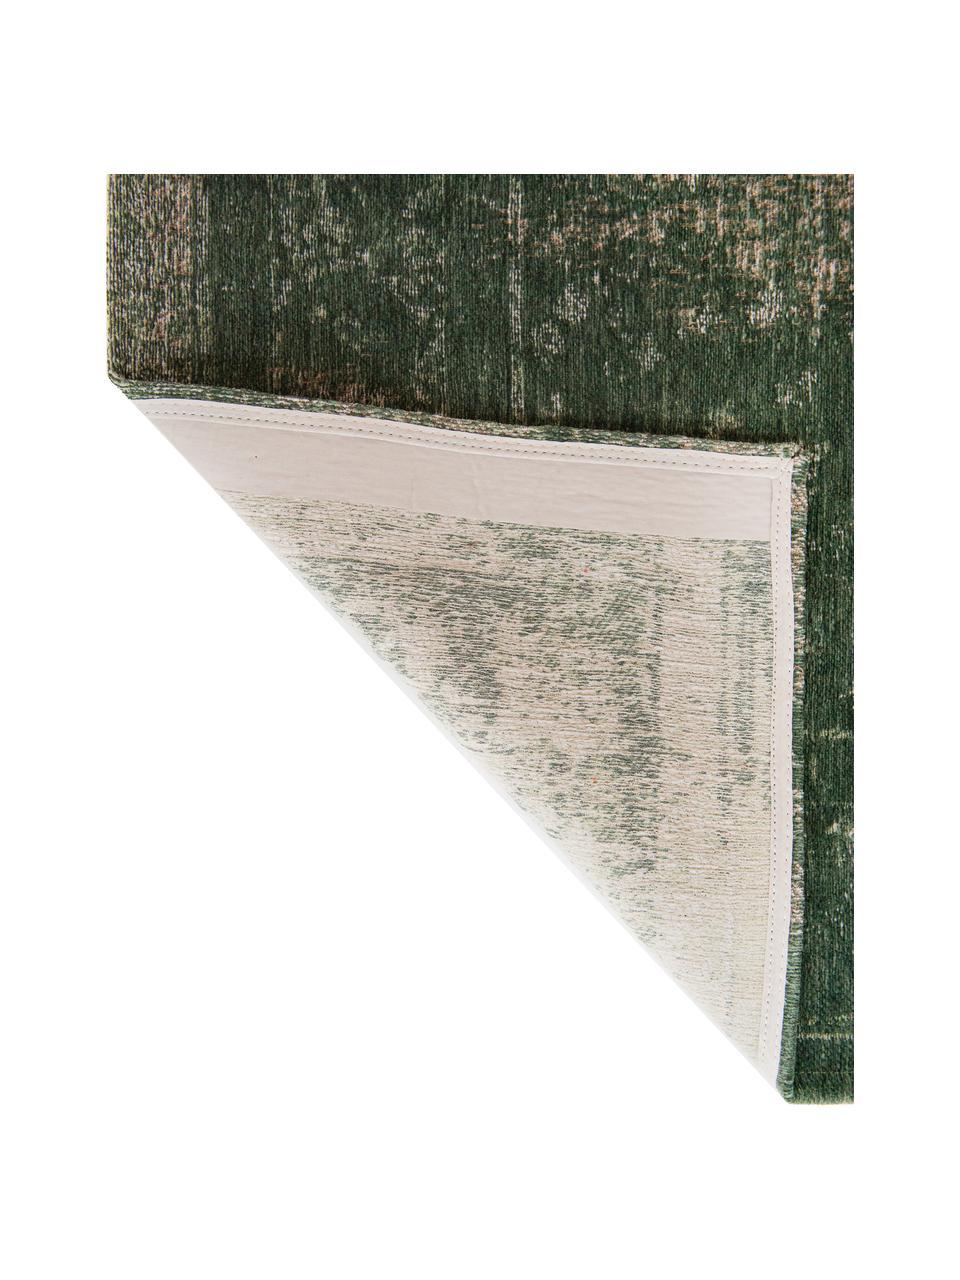 Vintage Chenilleteppich Medaillon in Dunkelgrün/Beige, Webart: Jacquard, Dunkelgrün, Beige, B 80 x L 150 cm (Größe XS)